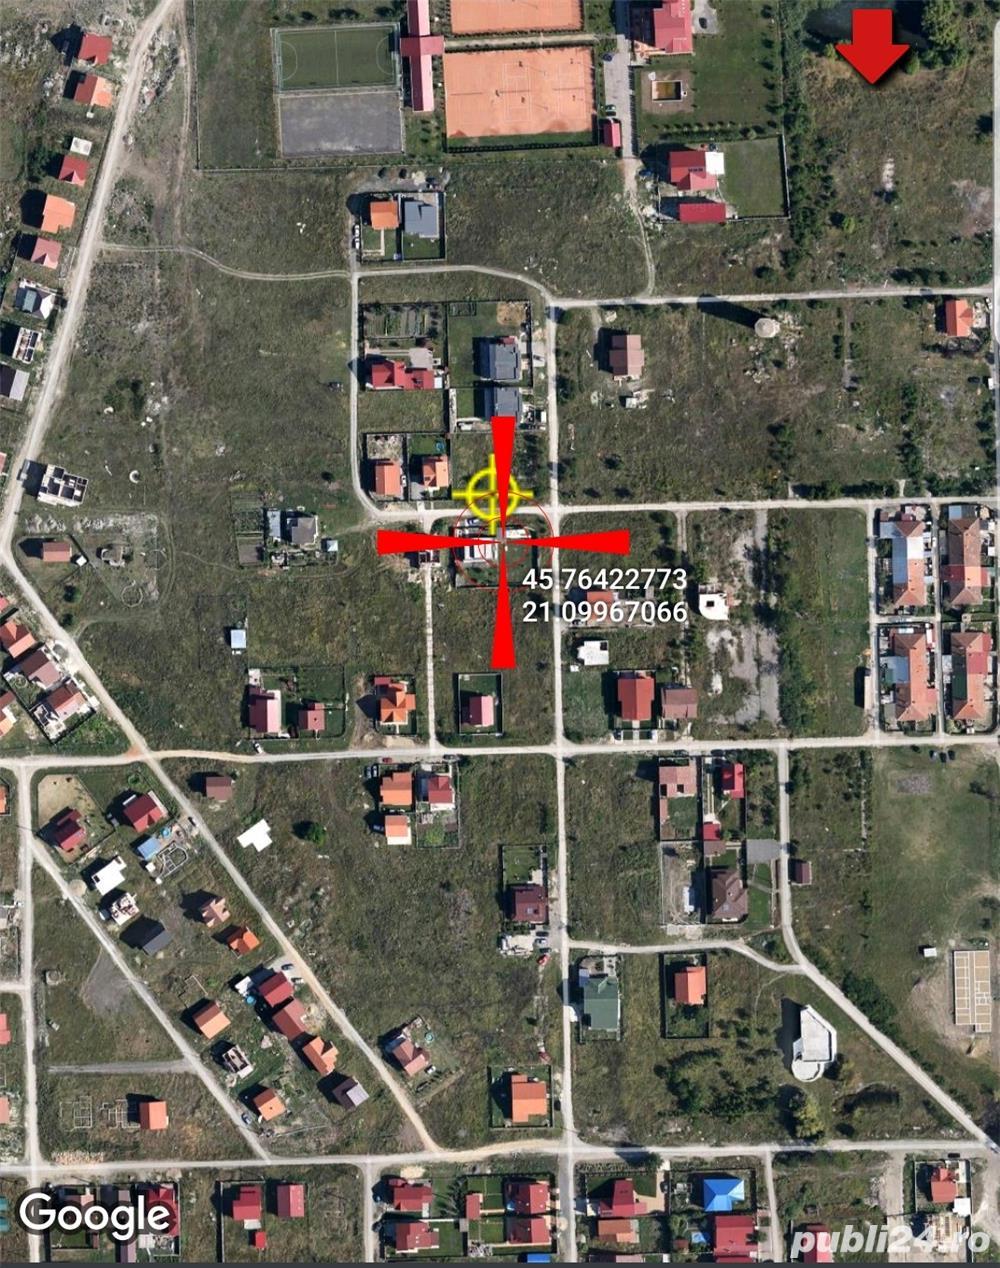 Sacalaz, 2 teren casa 500 si 475 mp, asfalt, curent, apa, gaz,  de la 23000euro